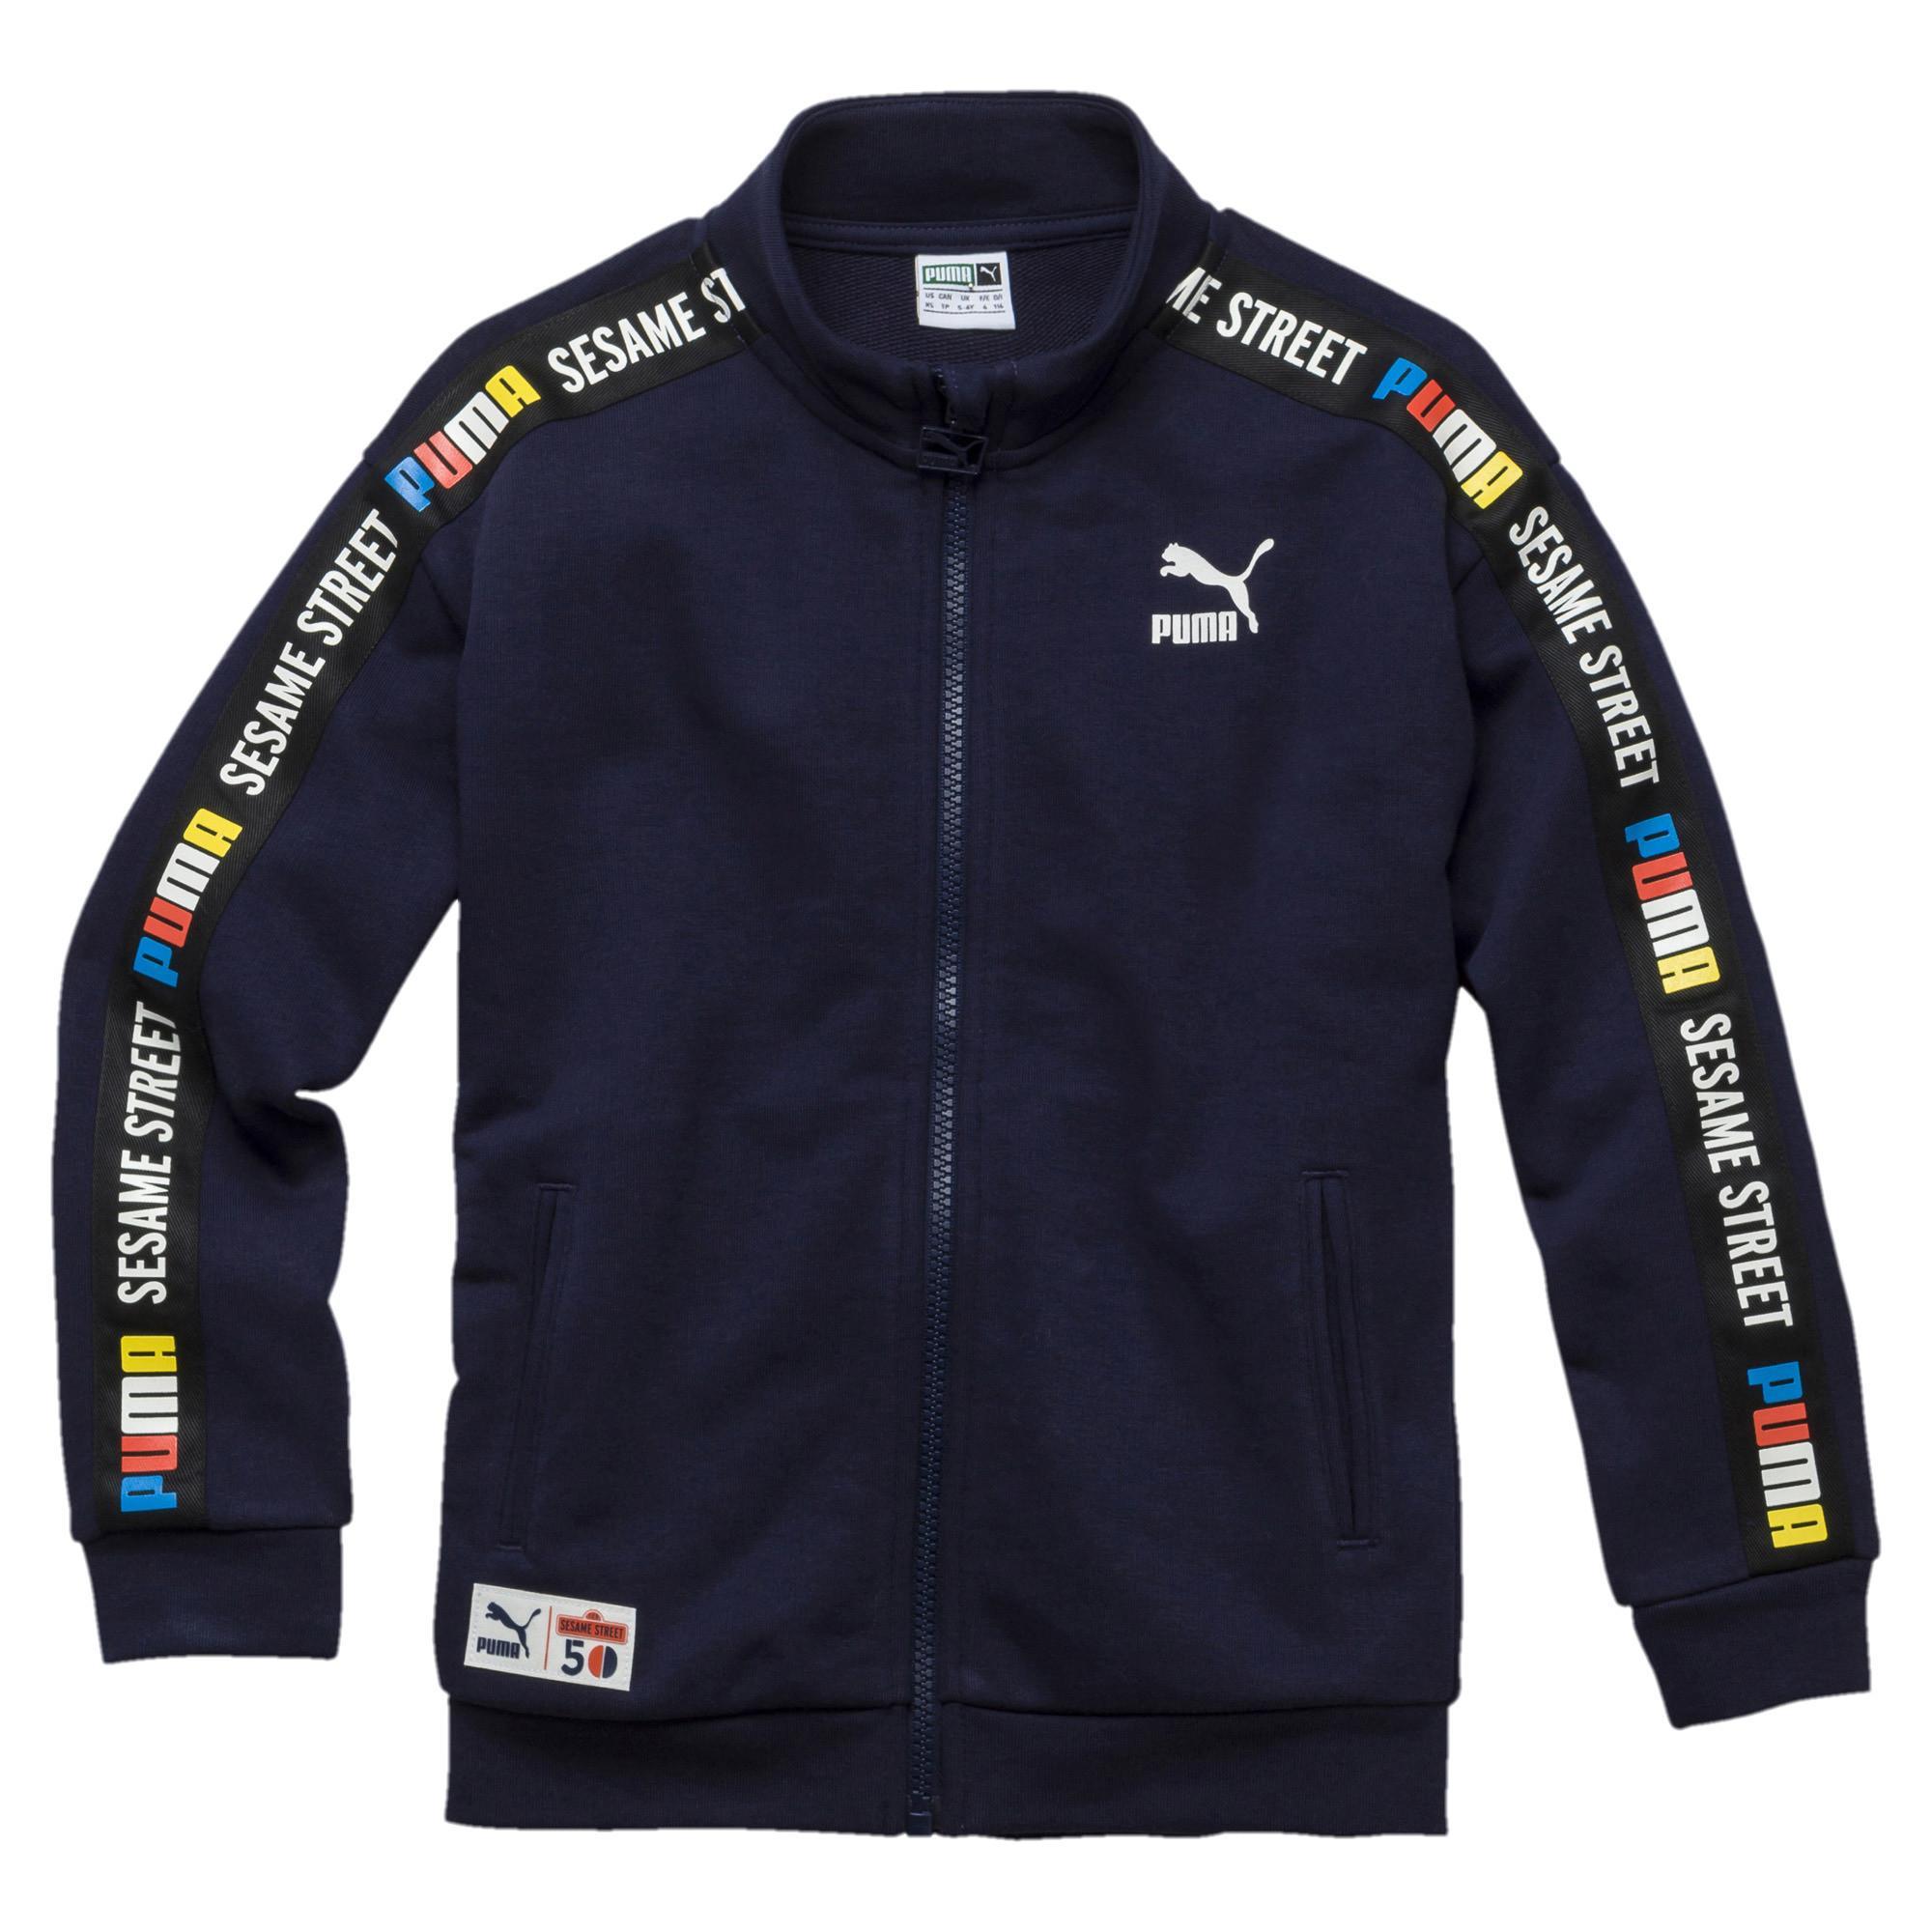 1e36266c66 Latest PUMA Boys' Jackets Products | Enjoy Huge Discounts | Lazada SG